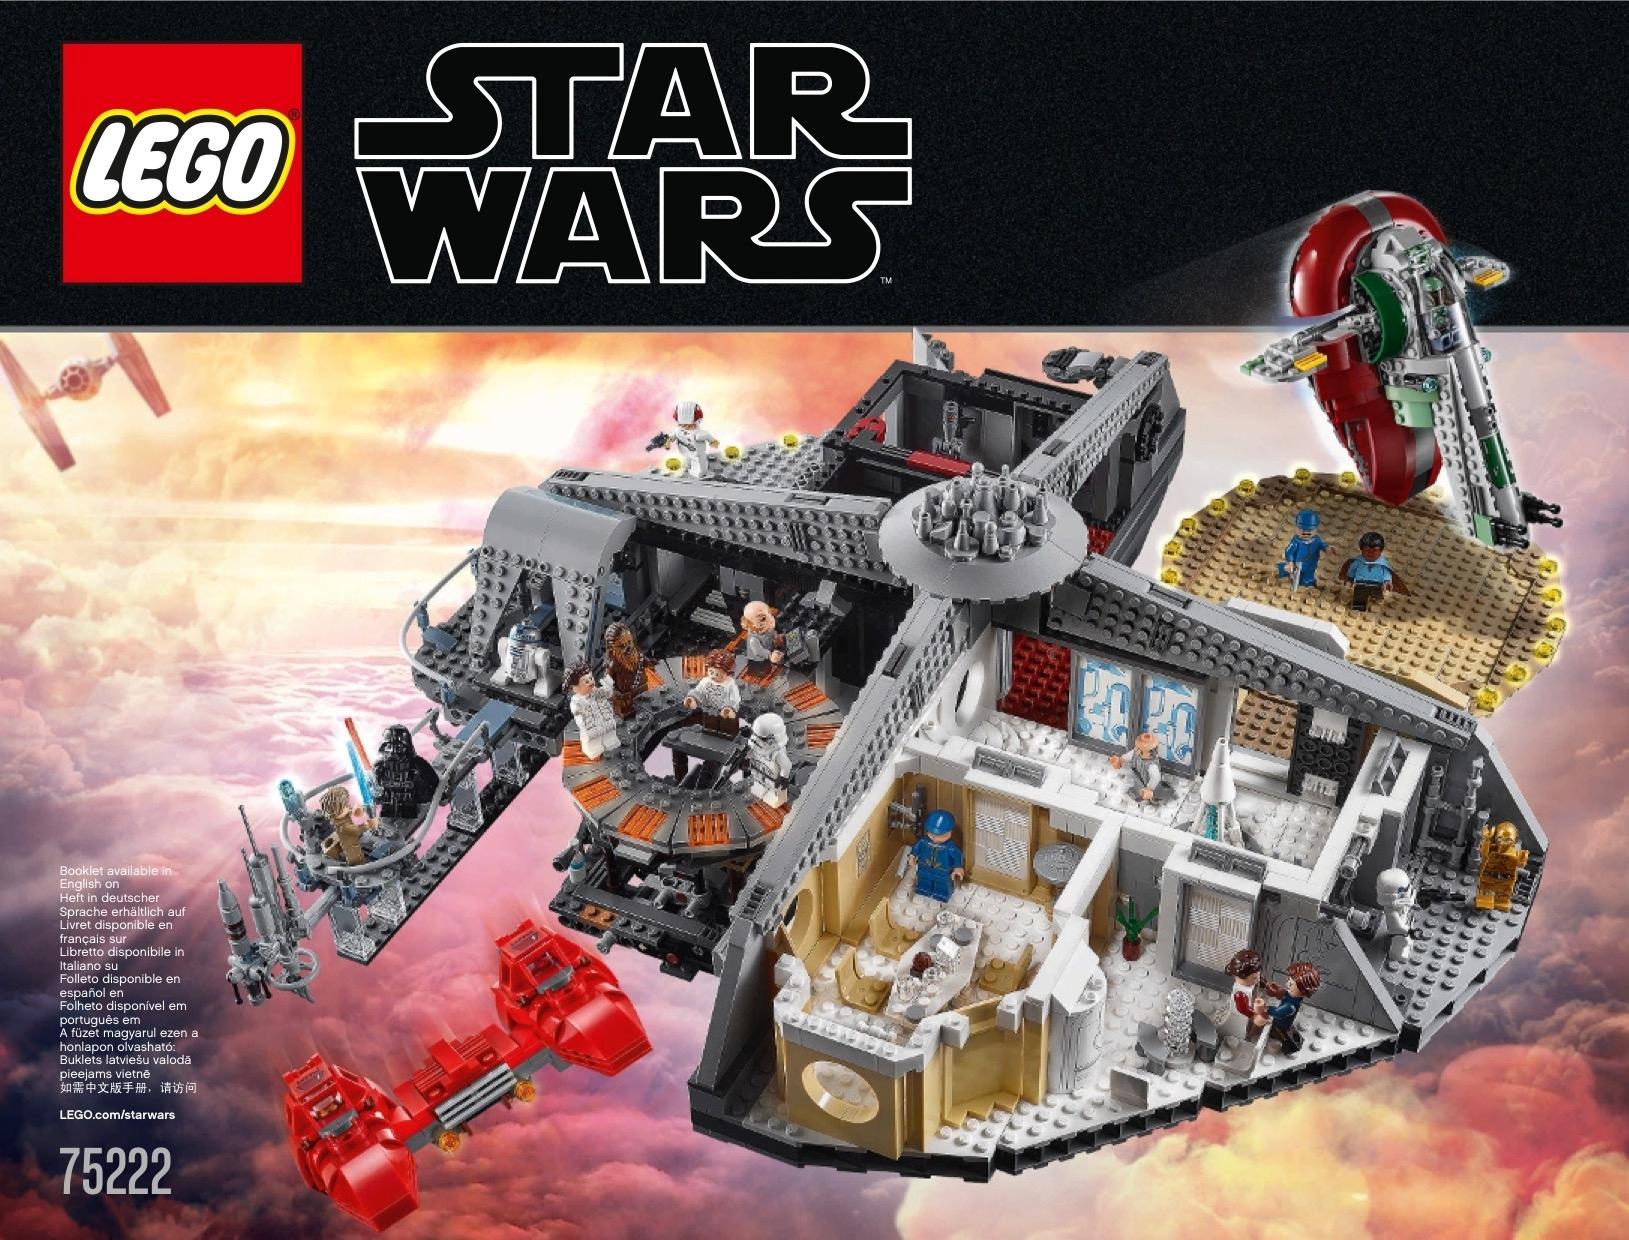 Lego Betrayal At Cloud City Instructions 75222, Star Wars regarding Lego Star Wars Lego City Cheats